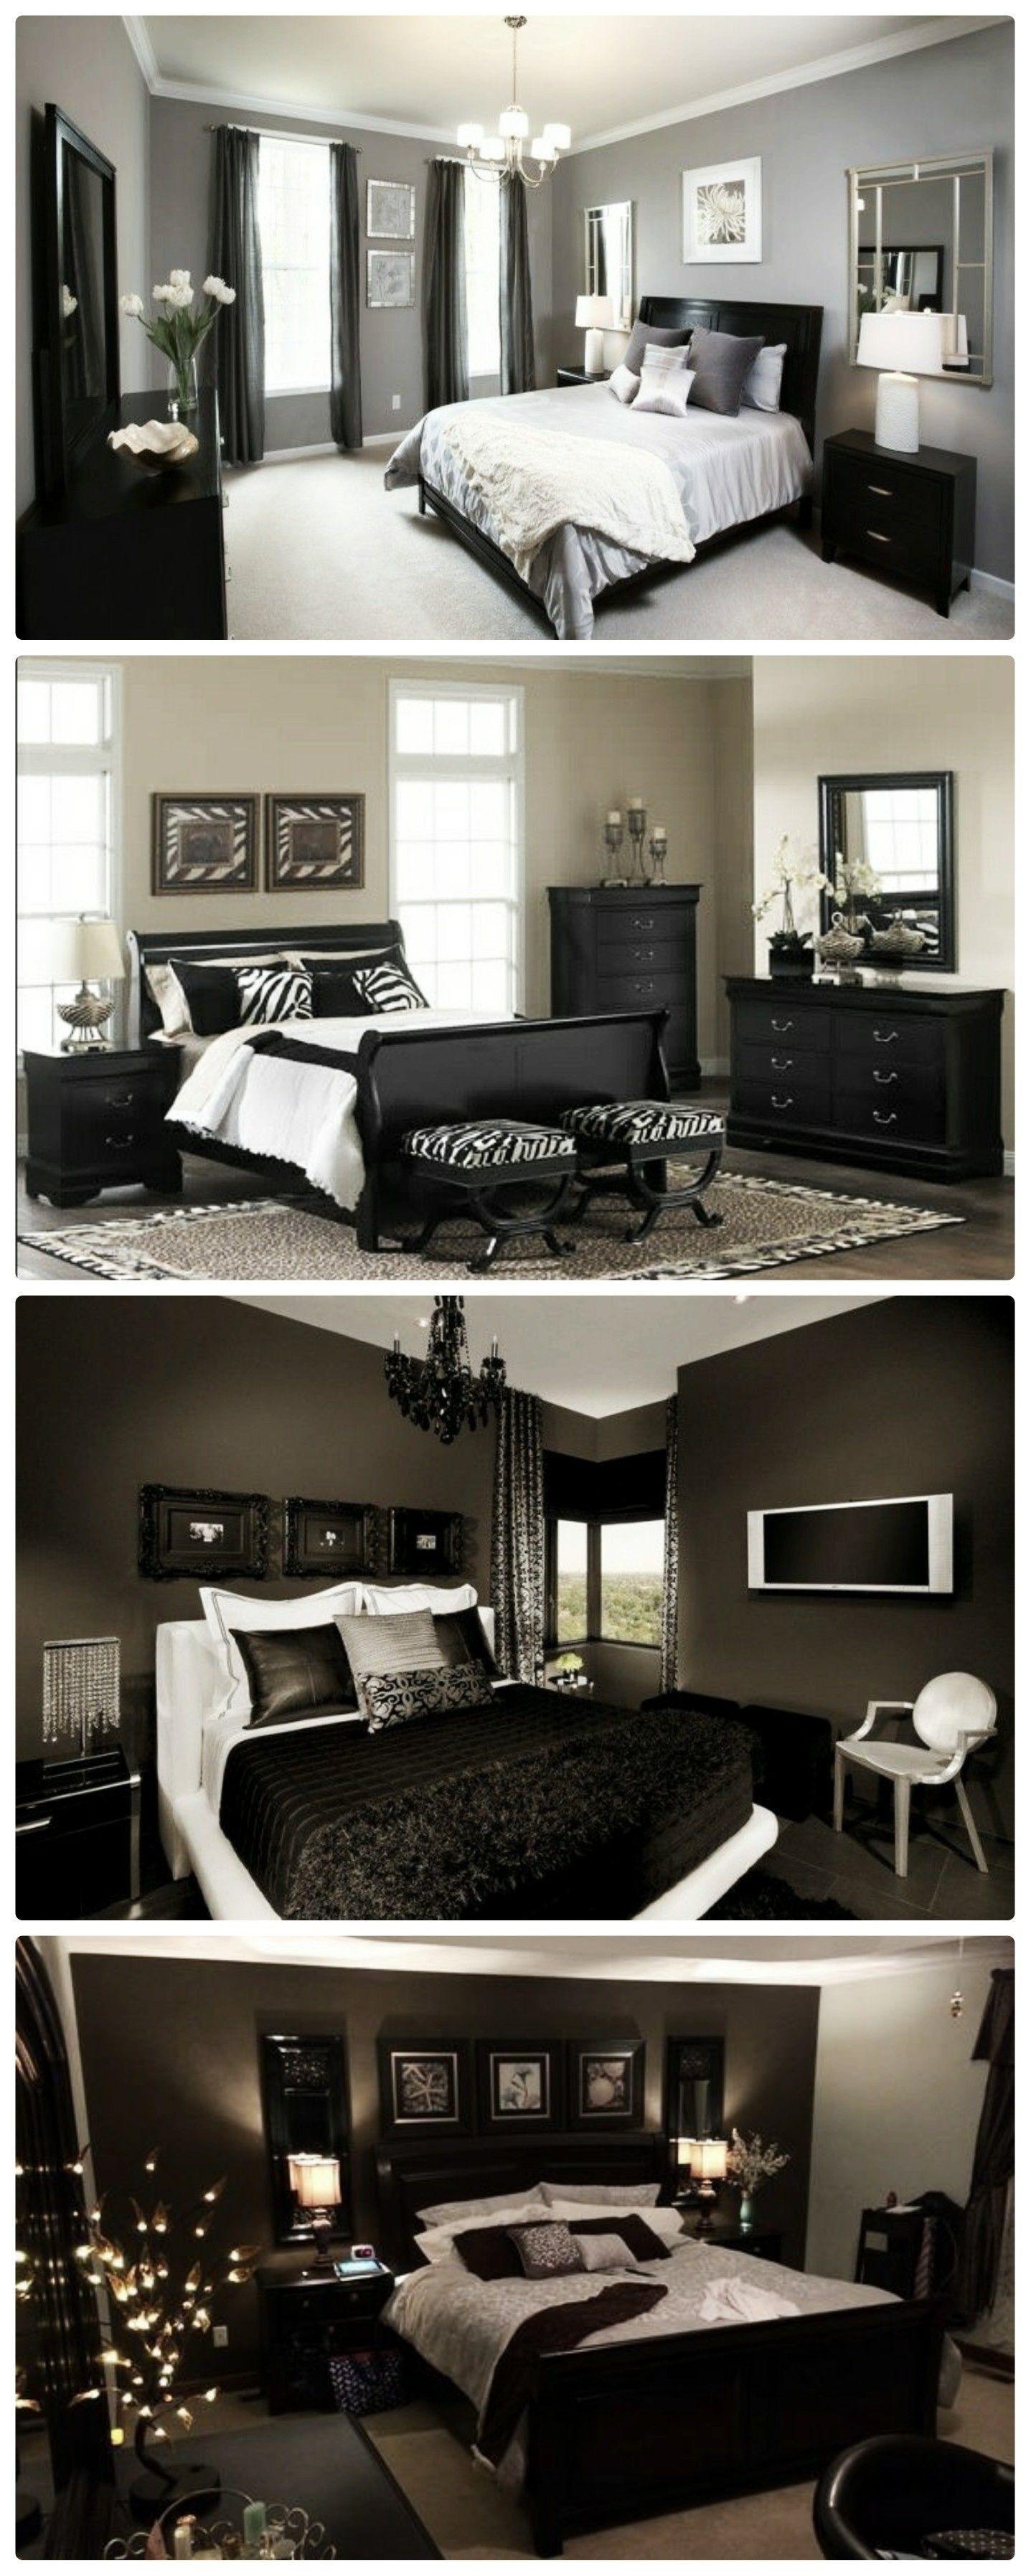 Best bedroom design ideas for romantic couples badroom